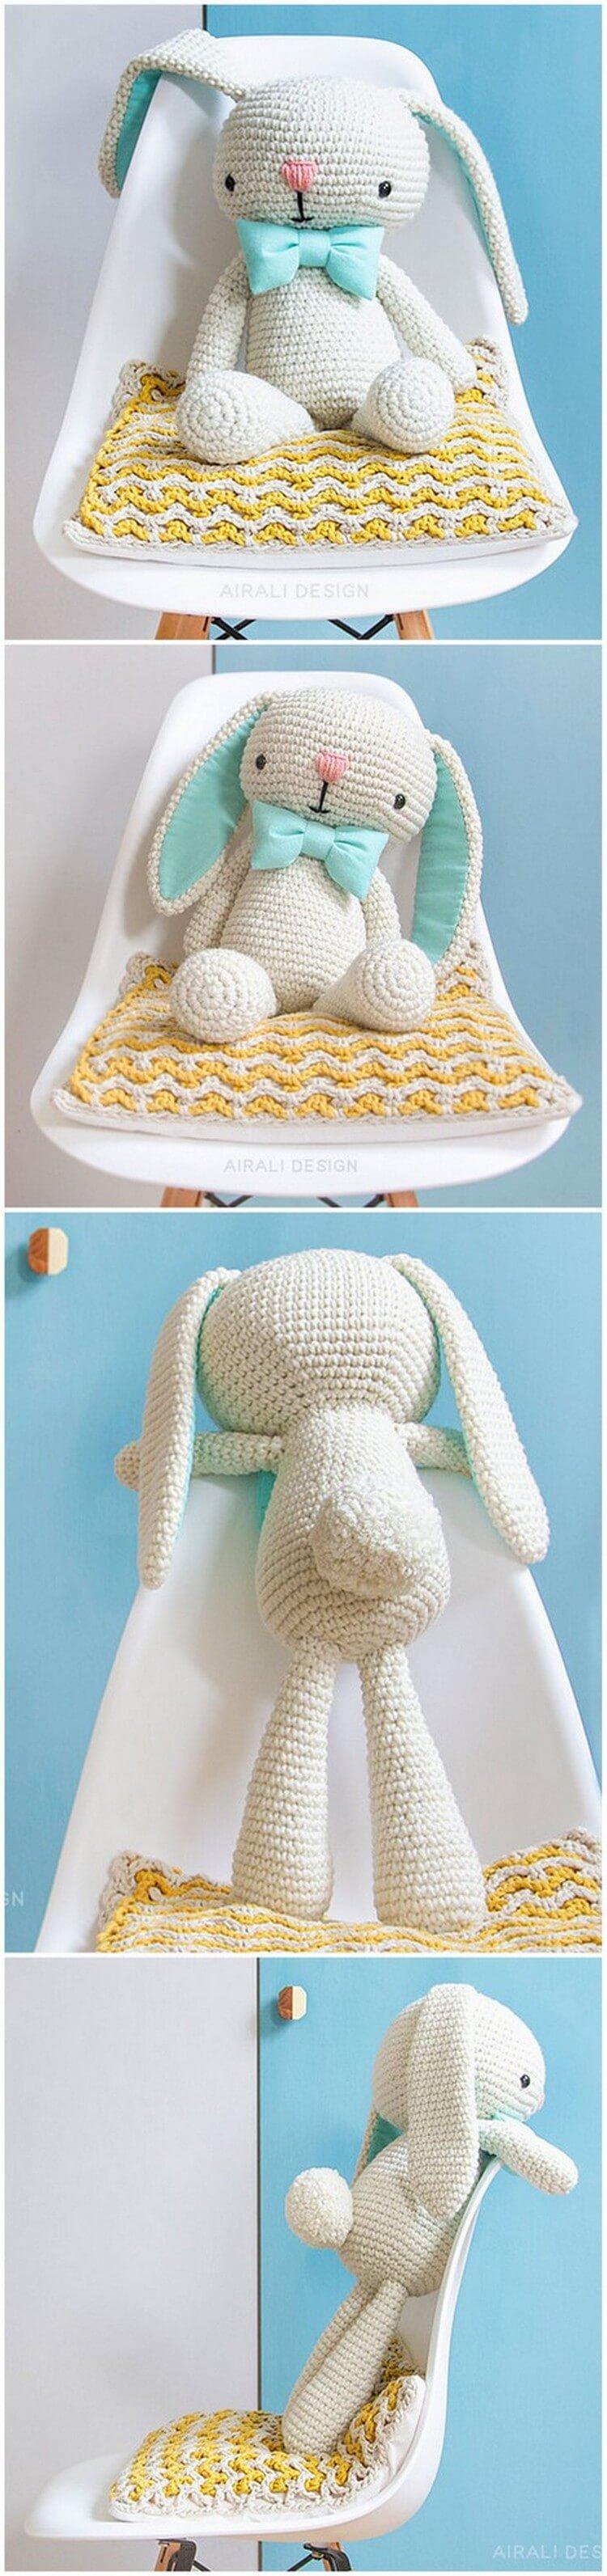 Crochet Amigurumi Pattern (17)